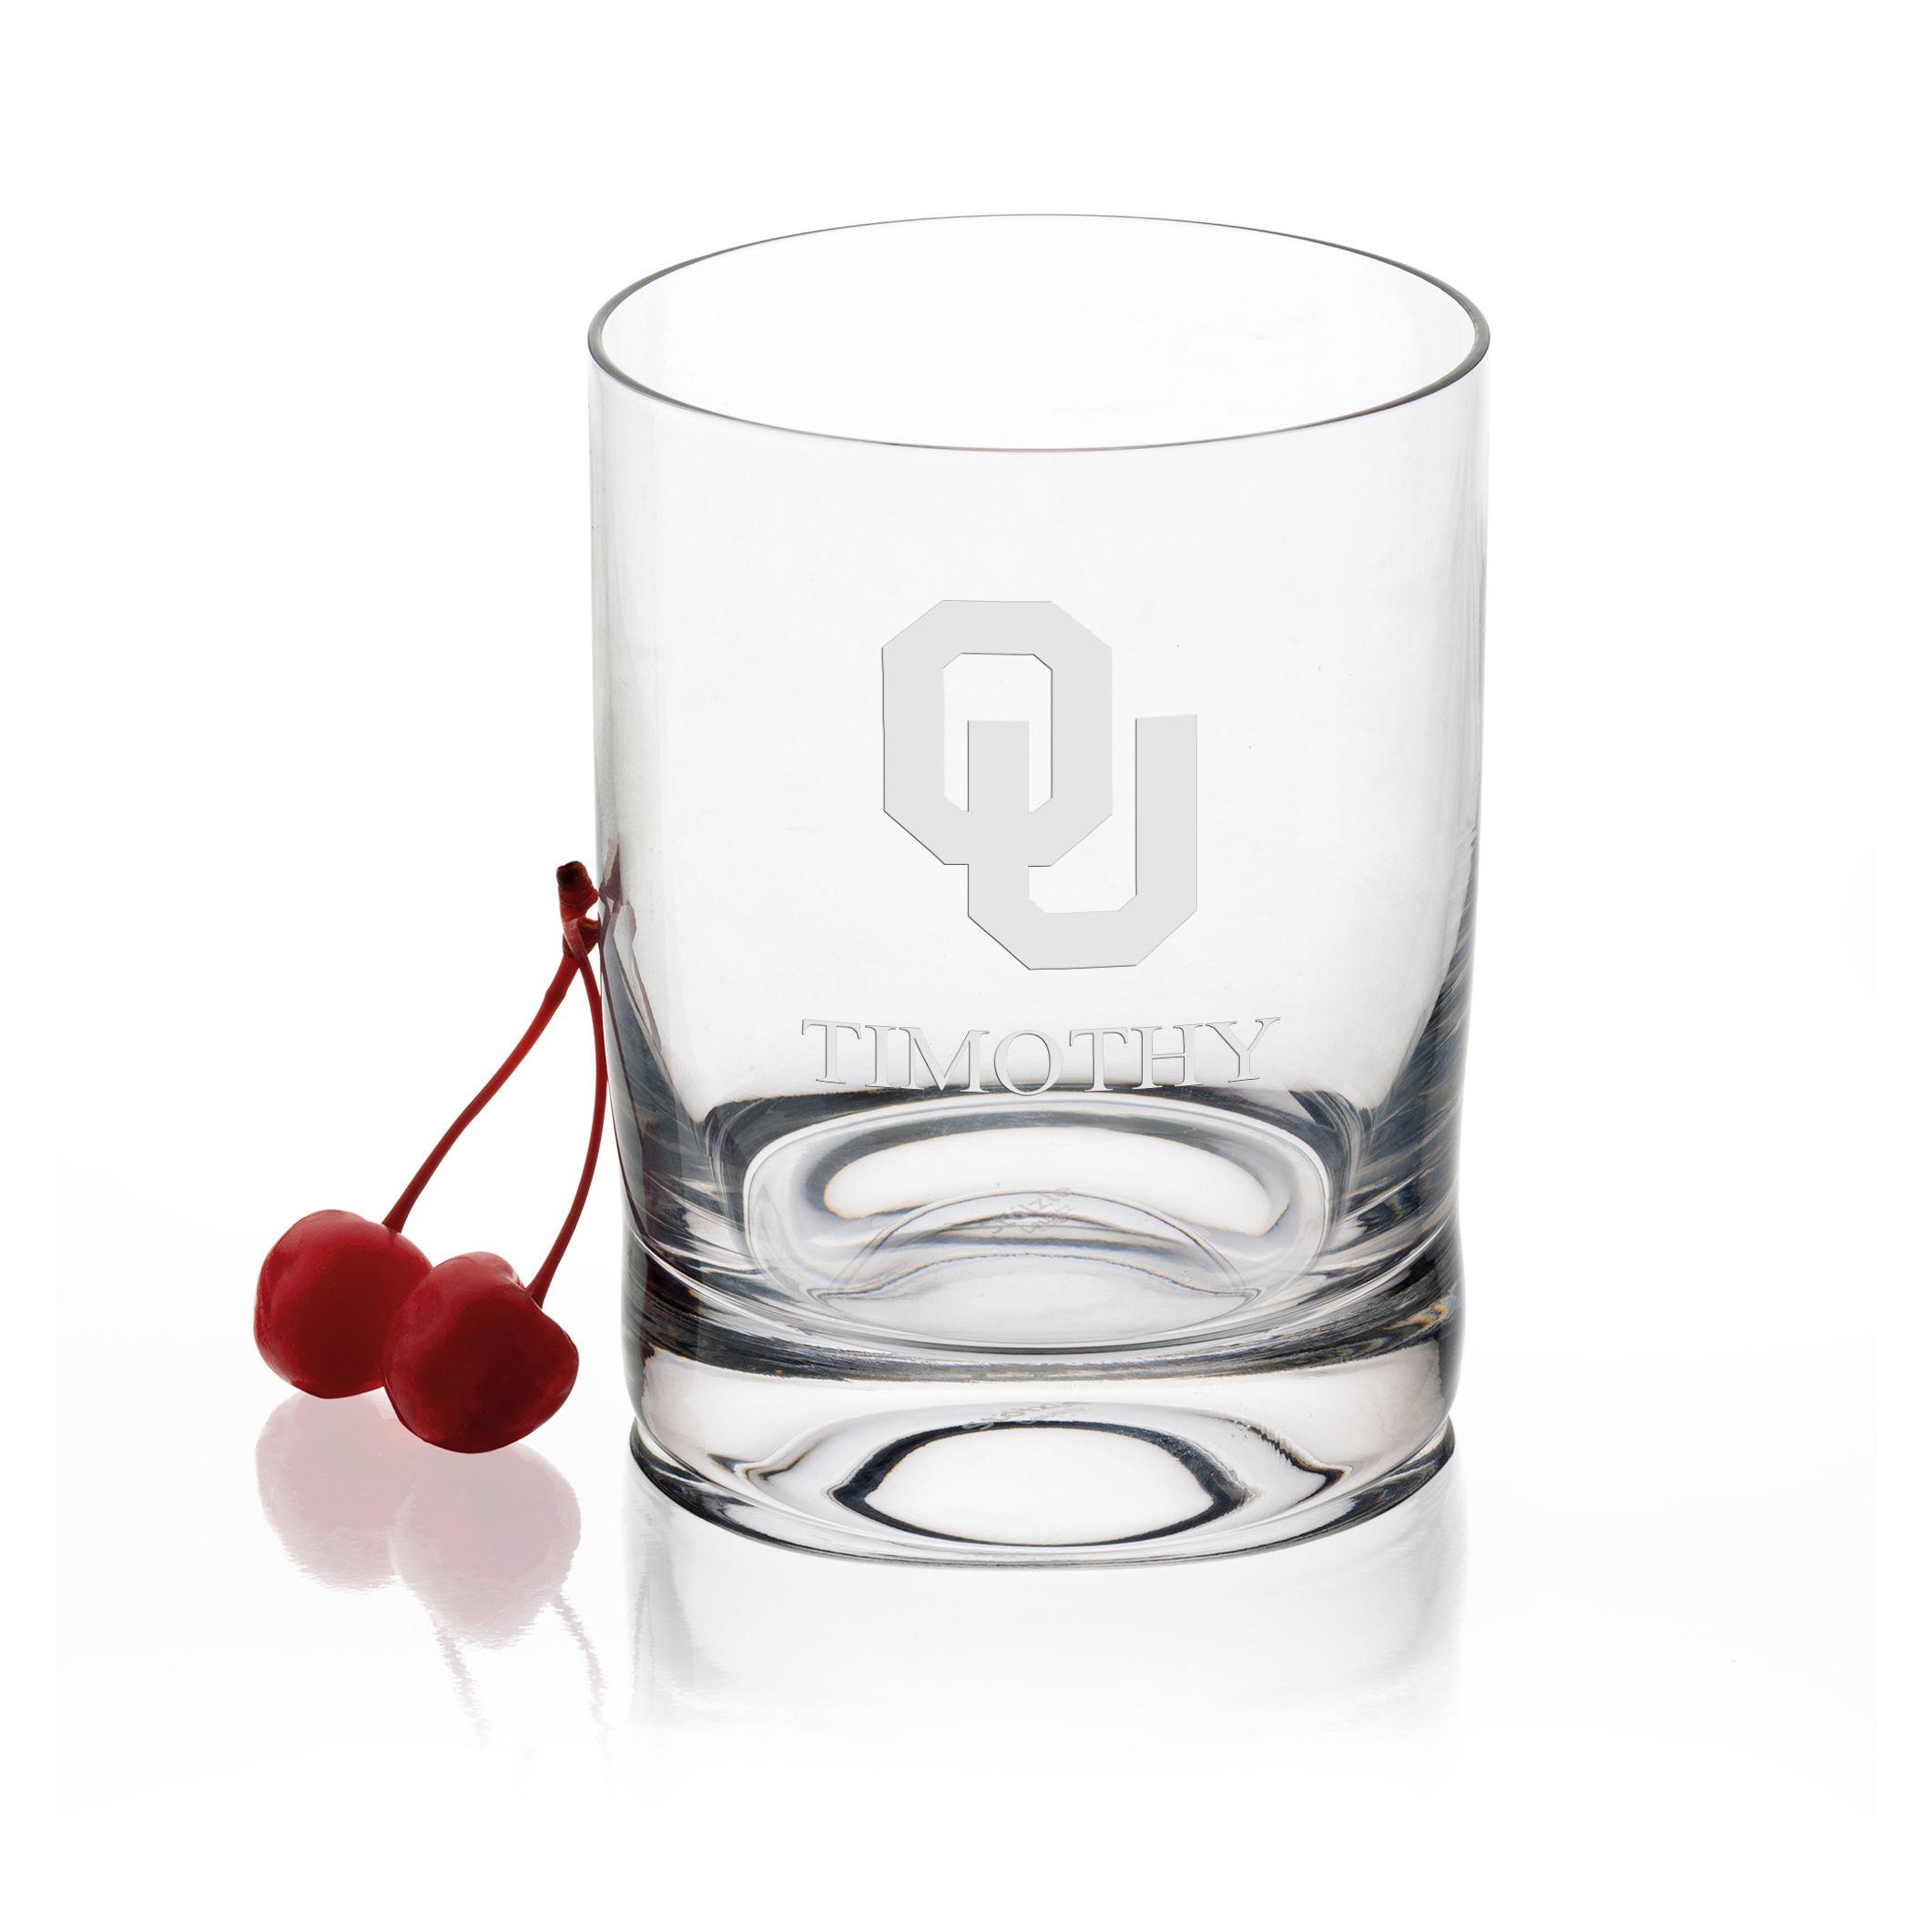 Oklahoma Tumbler Glasses - Set of 2